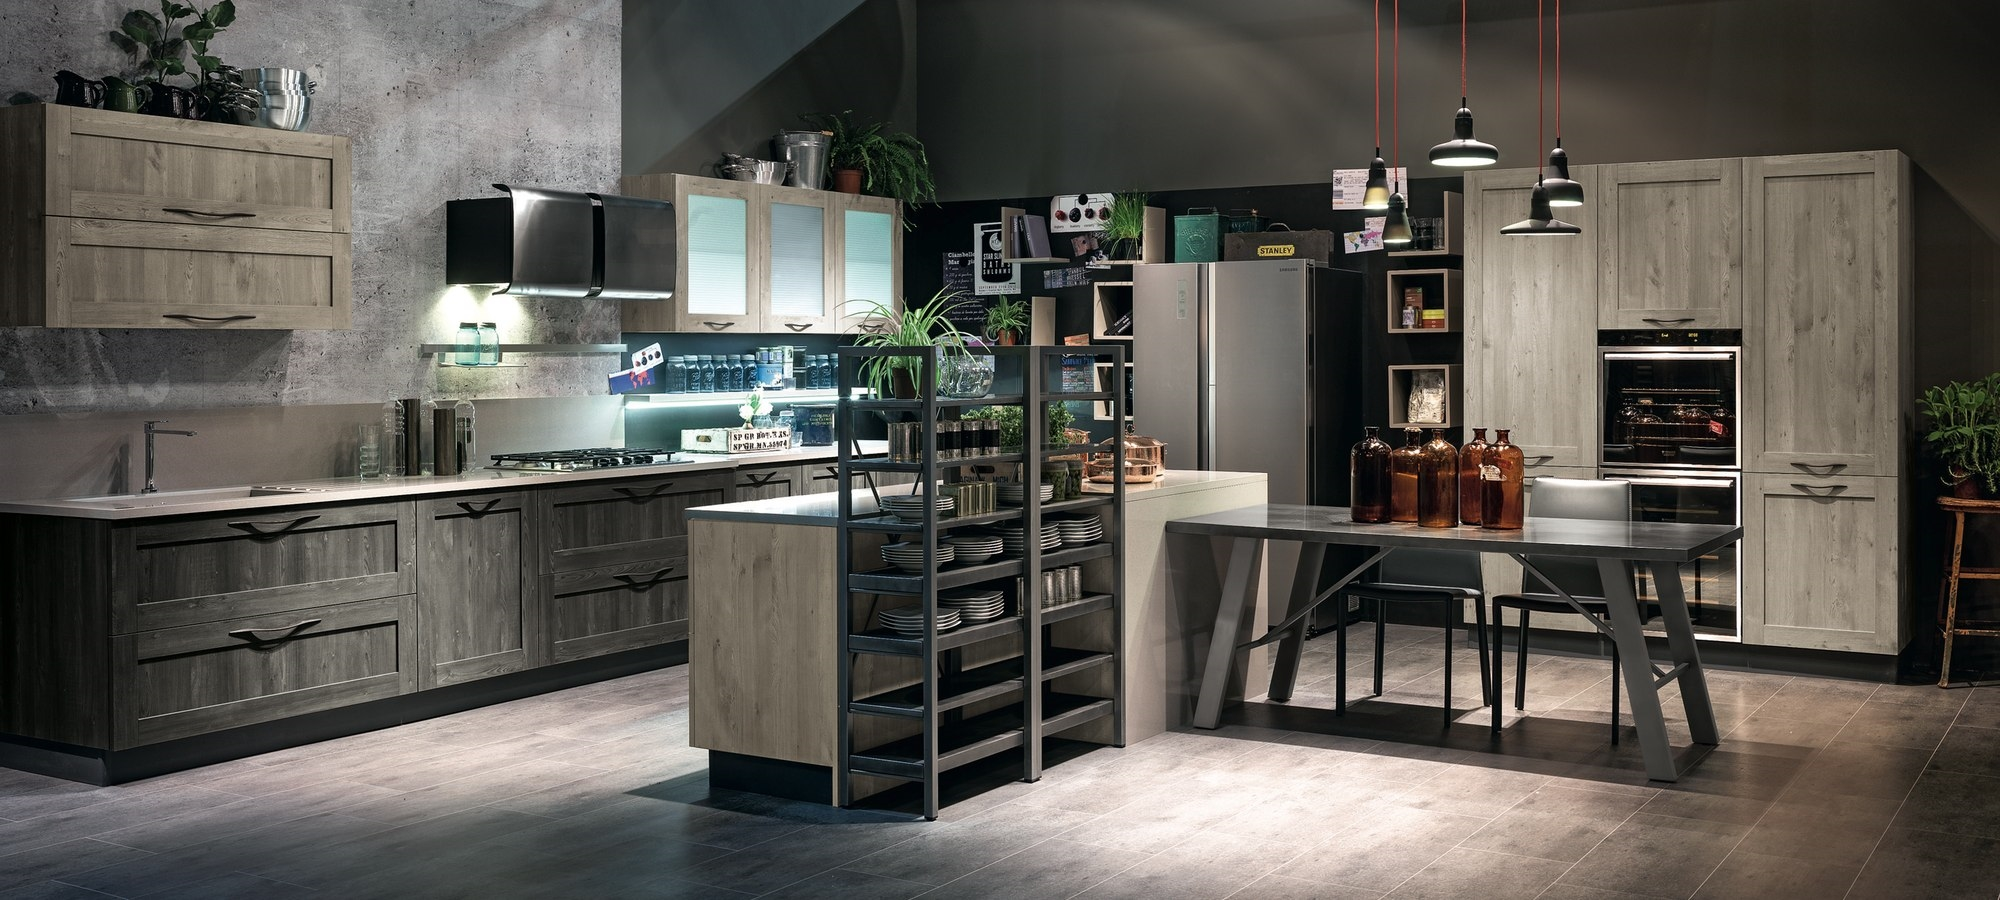 Cucina stosa cucine city composizione tipo 01 cucine a for Stosa cucina